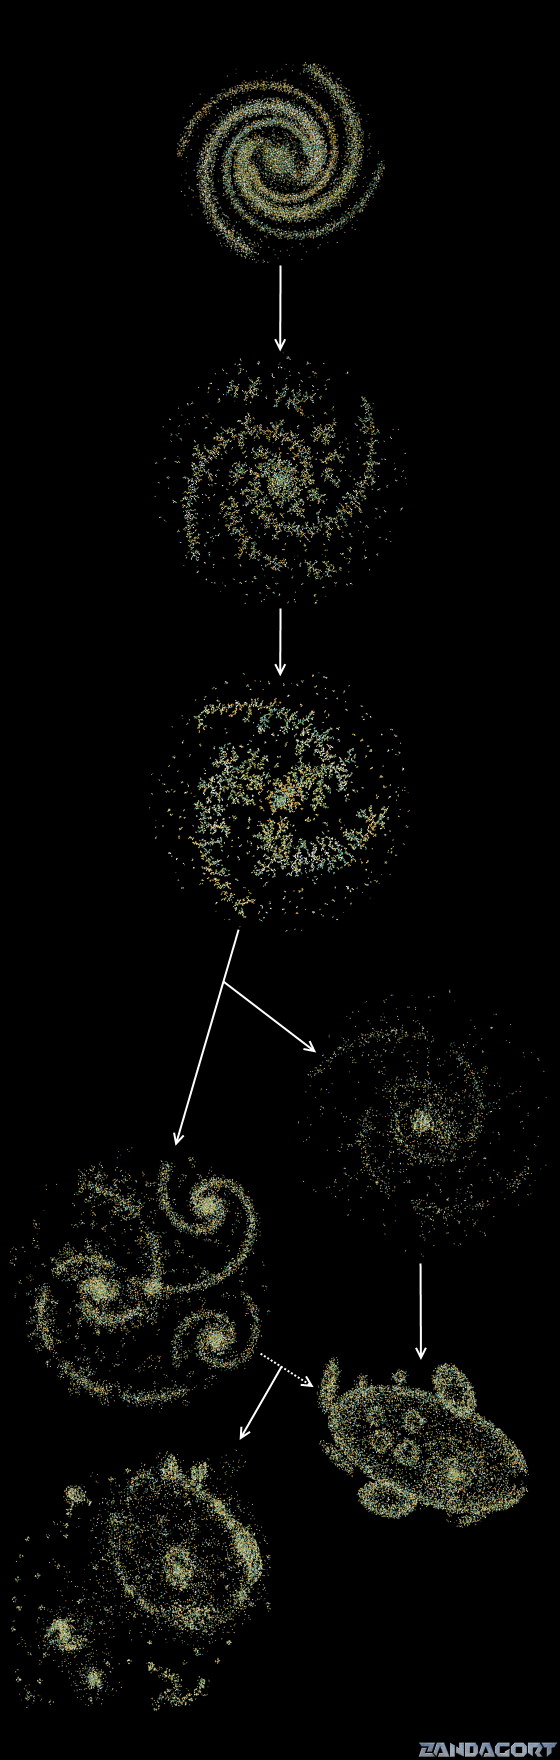 Zandagort galaxisok s1-től s7-ig